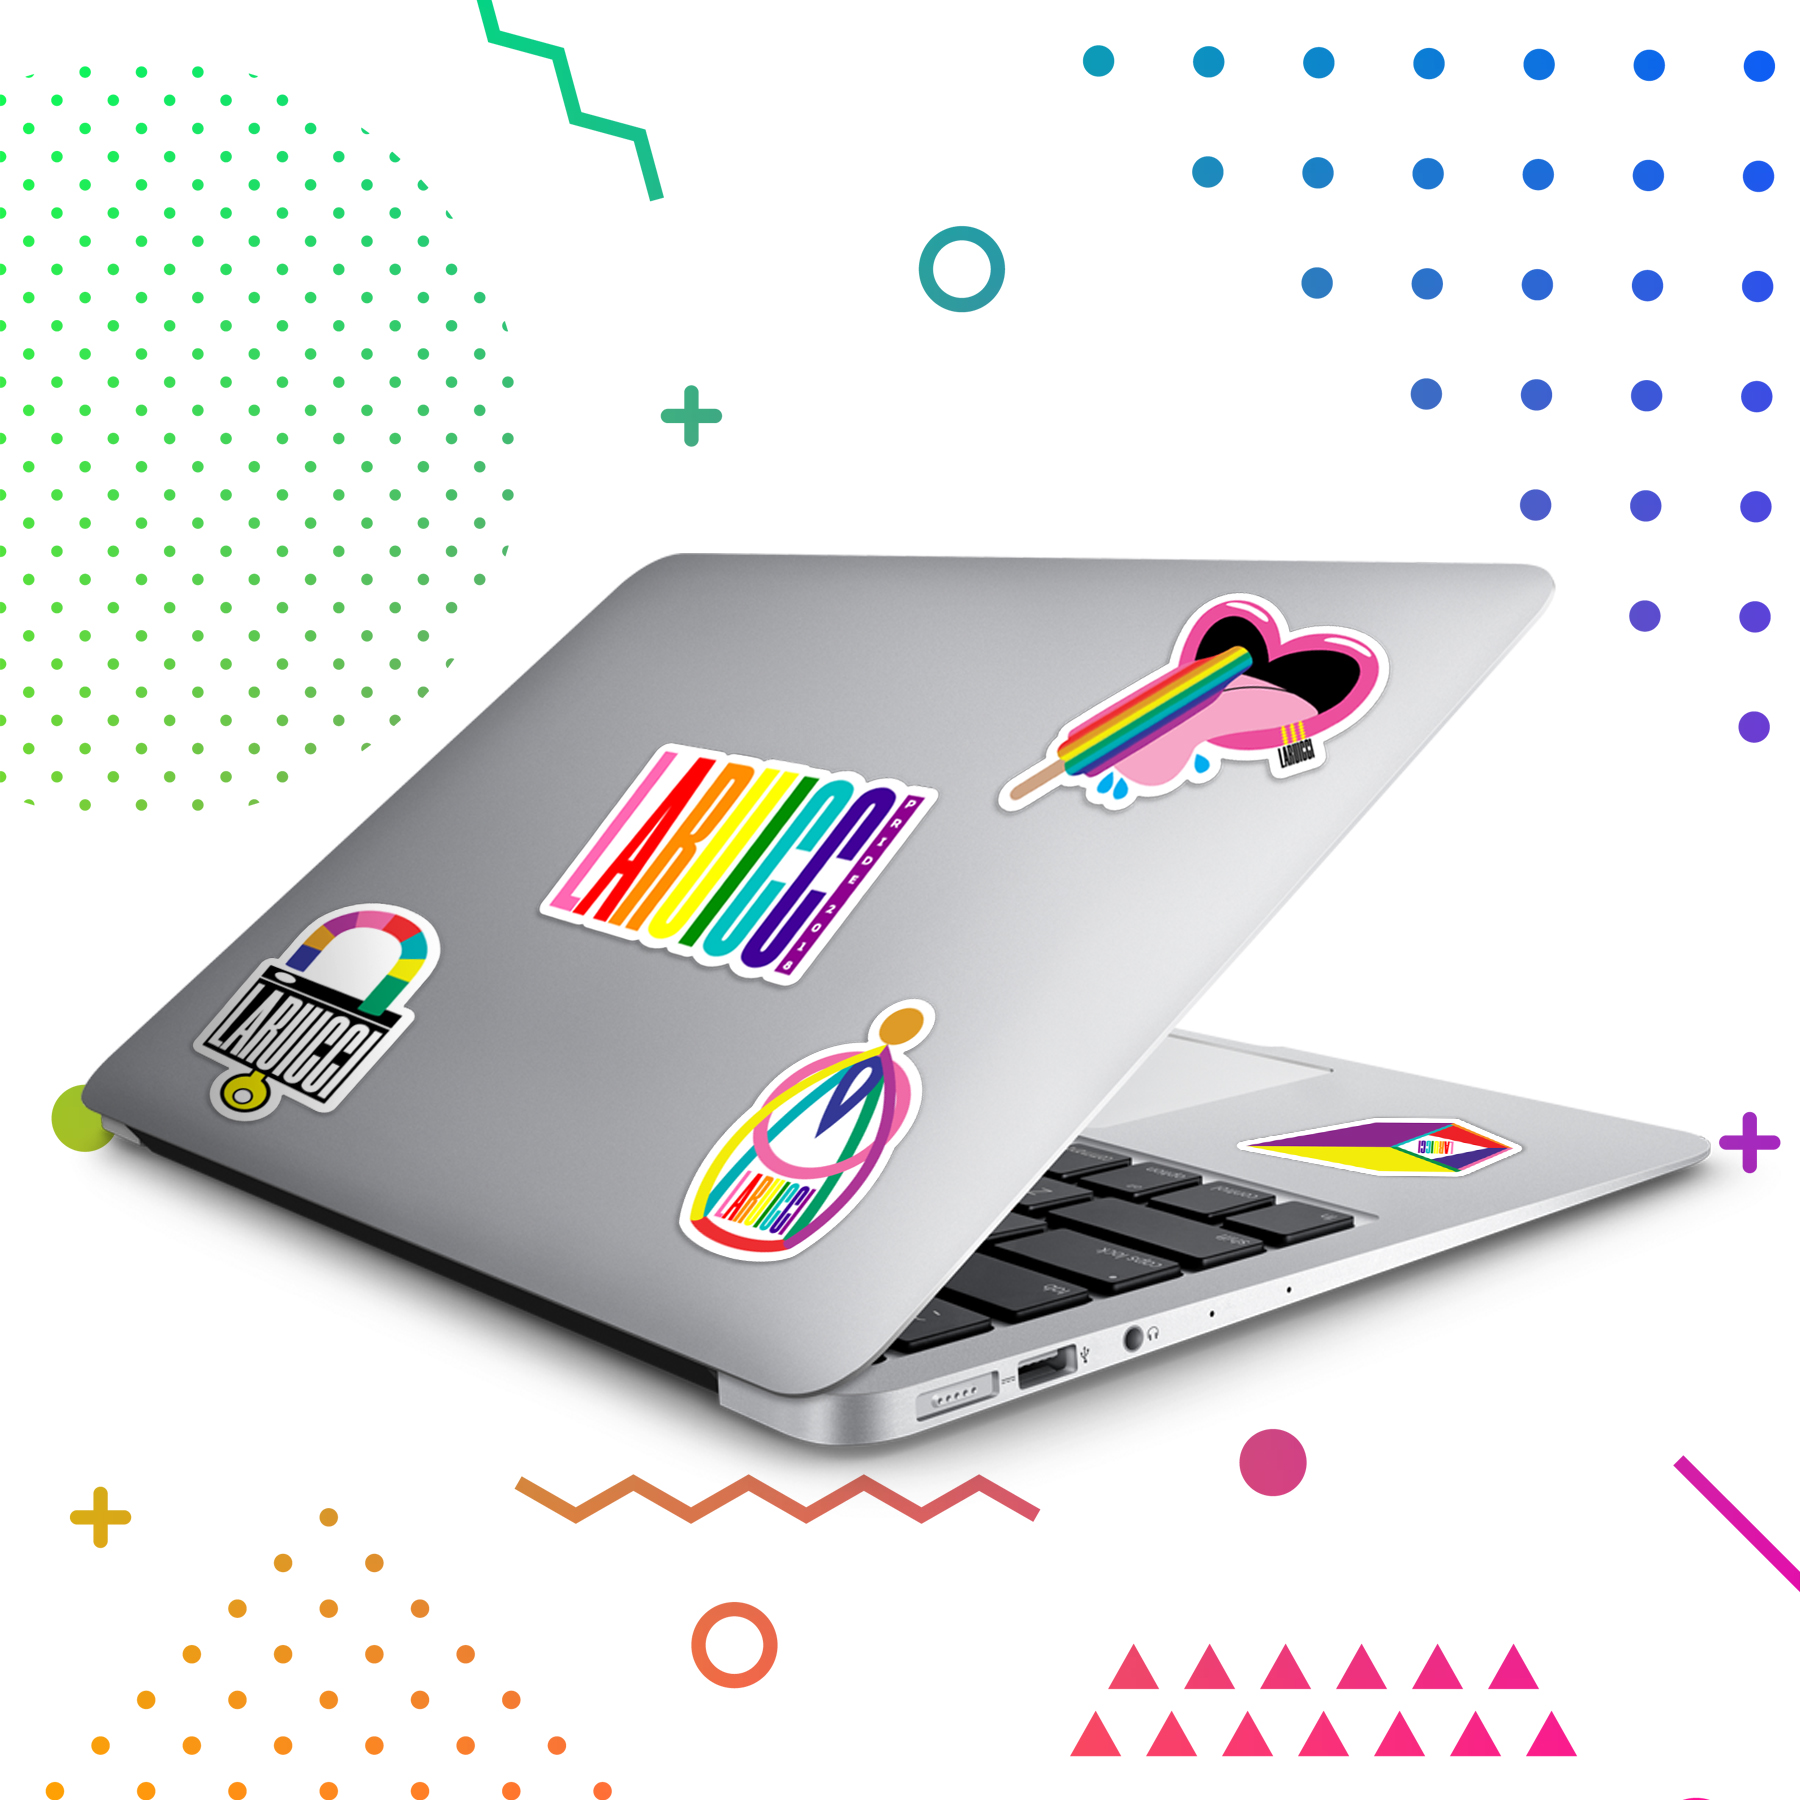 Sticker Laptop.jpg